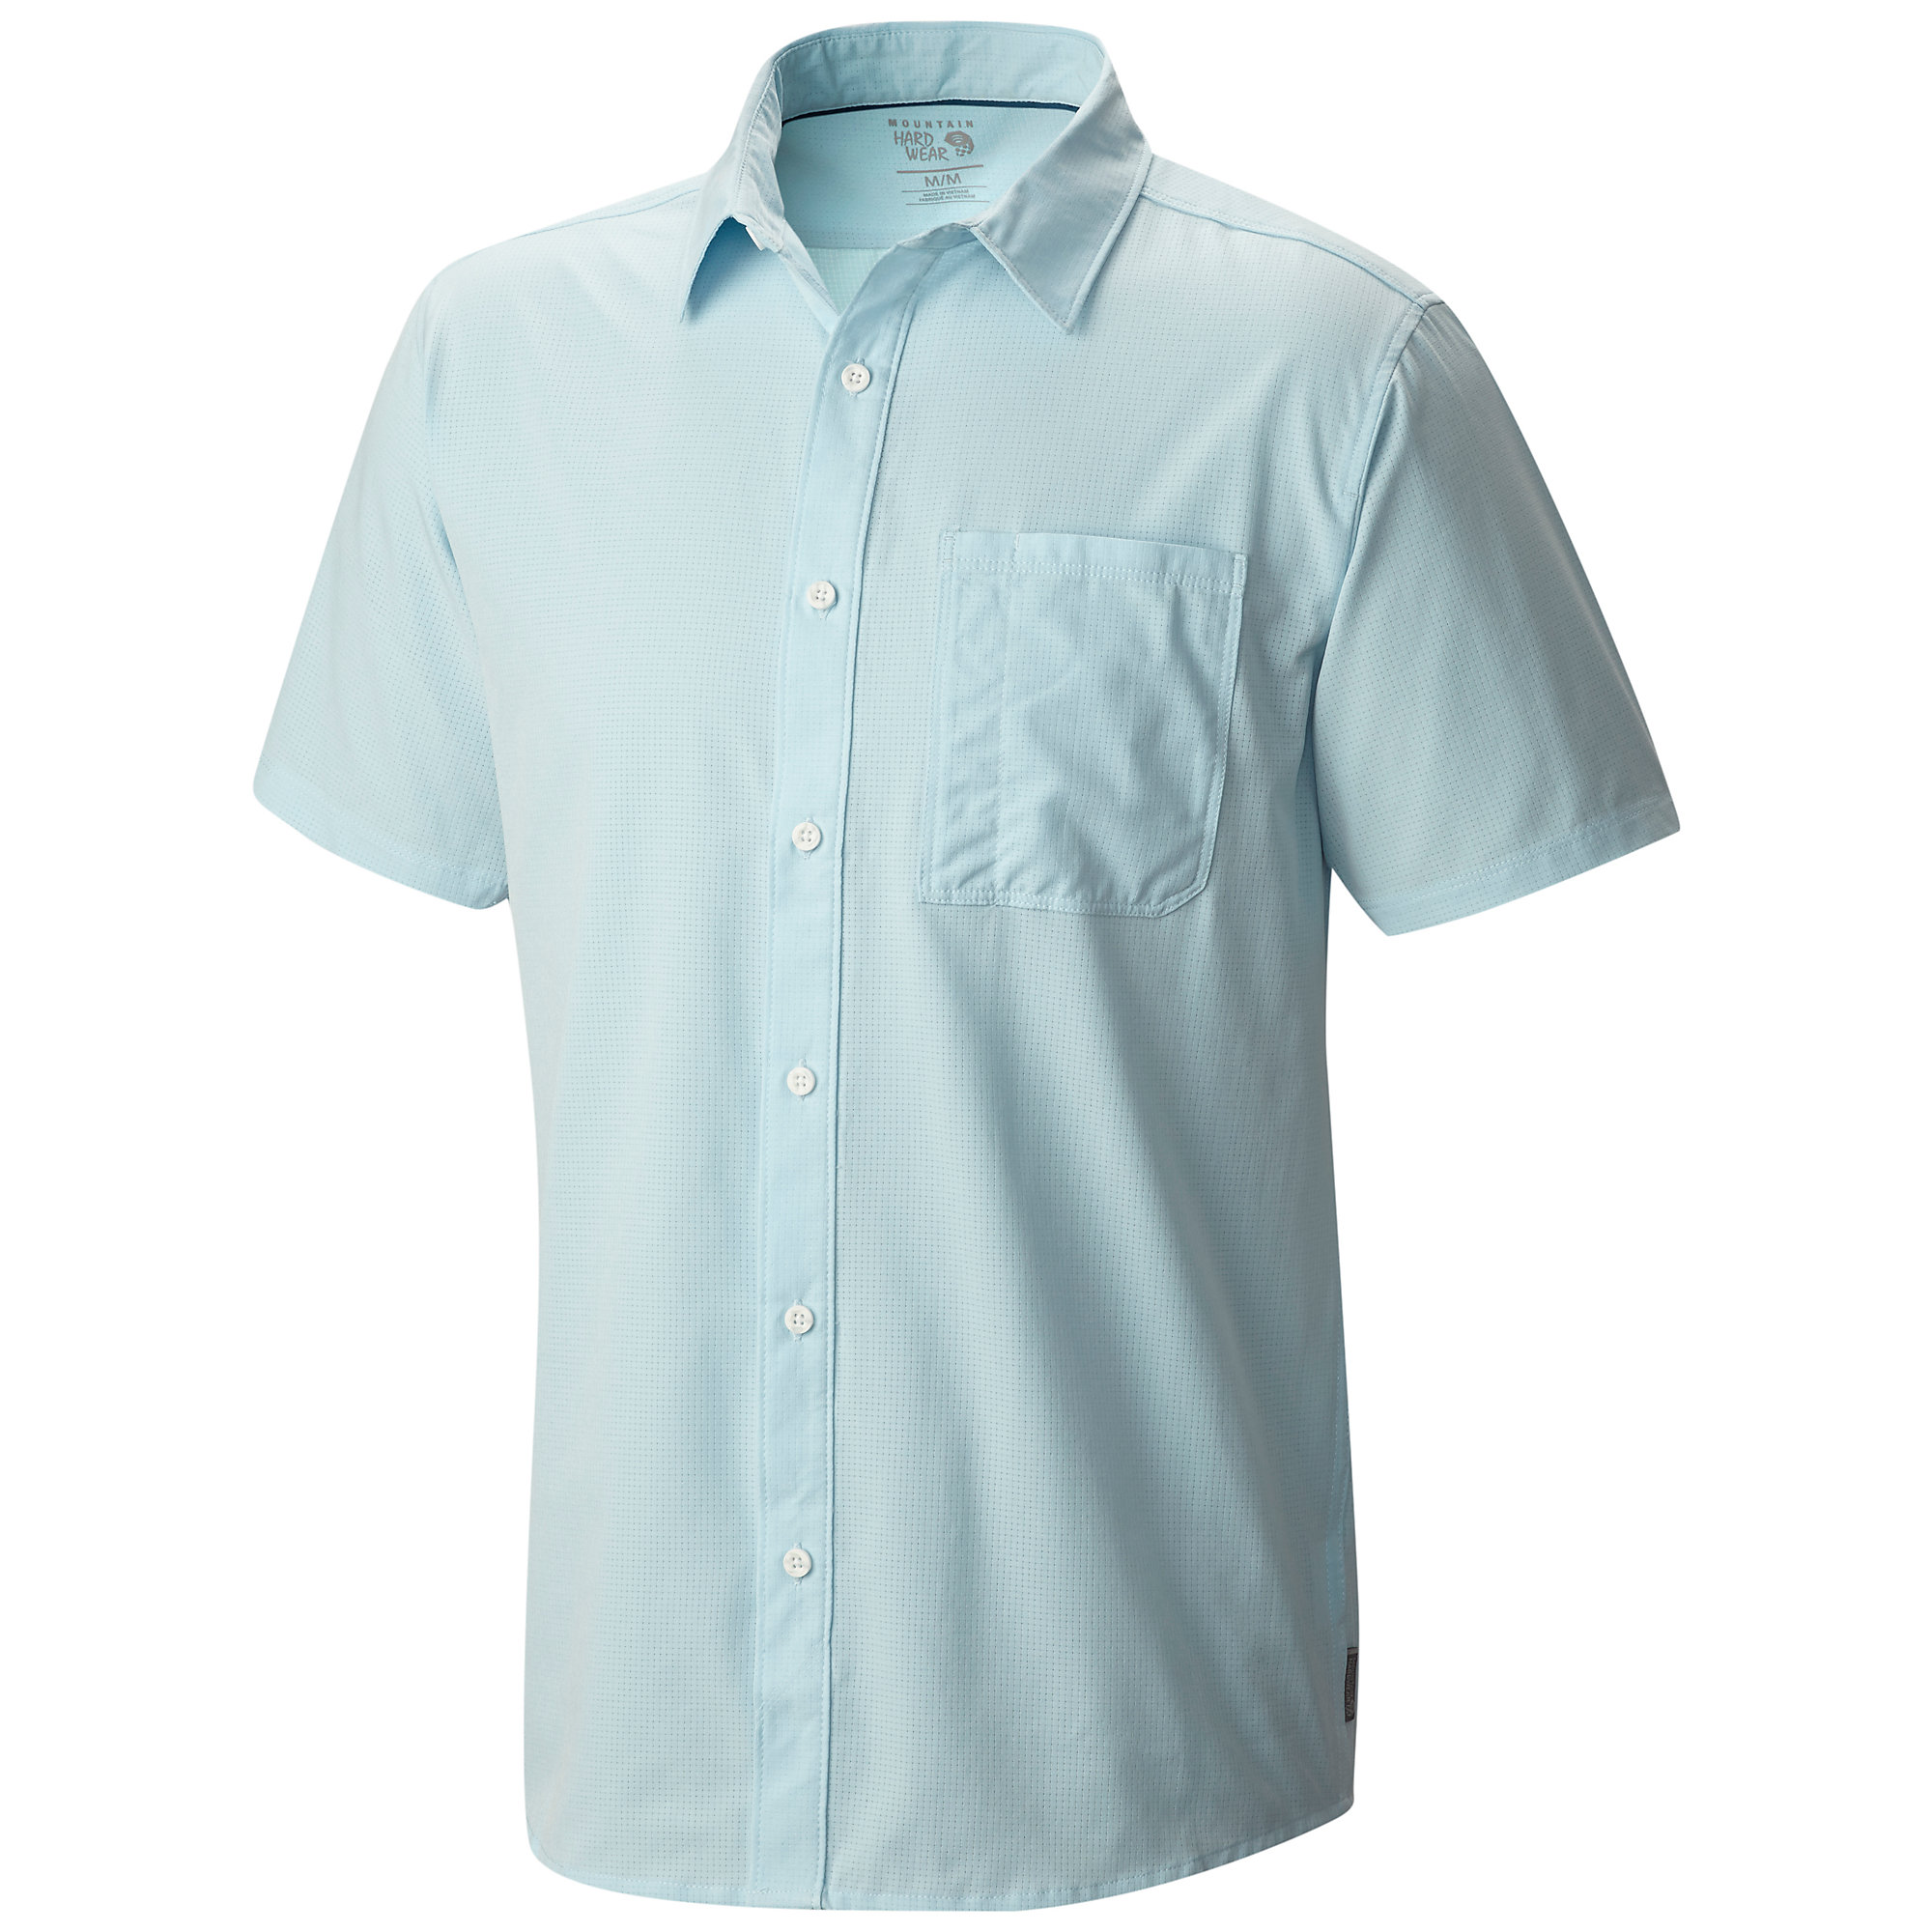 Mountain Hardwear Air Tech Short Sleeve Shirt